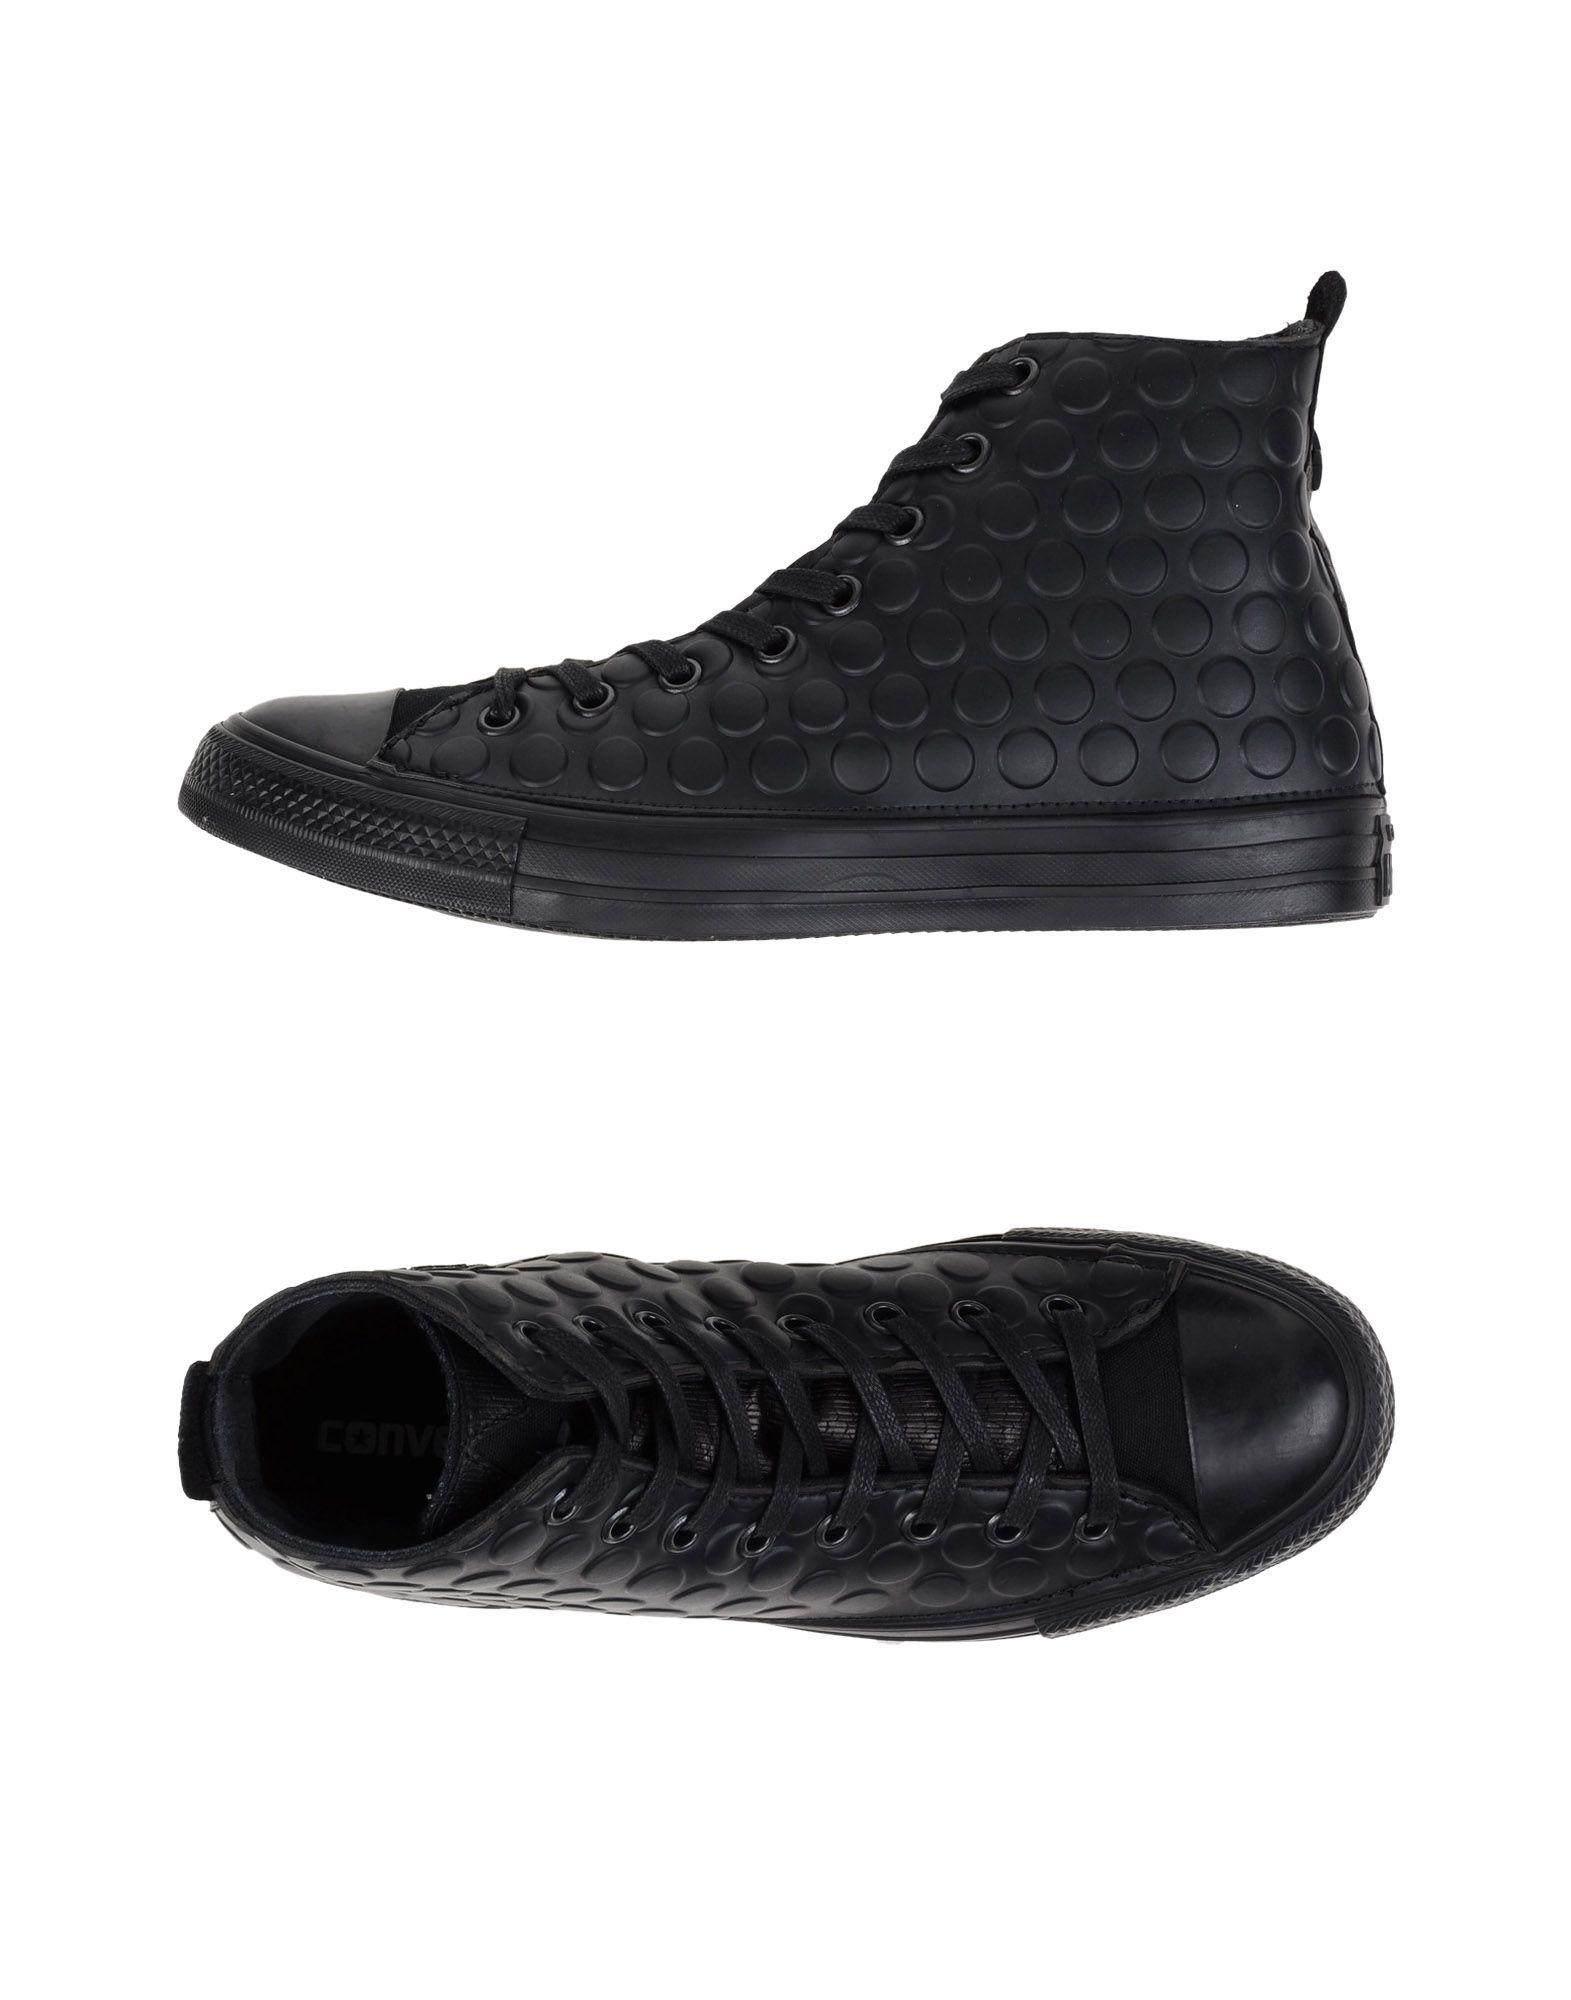 CONVERSE LIMITED EDITION Высокие кеды и кроссовки converse limited edition высокие кеды и кроссовки